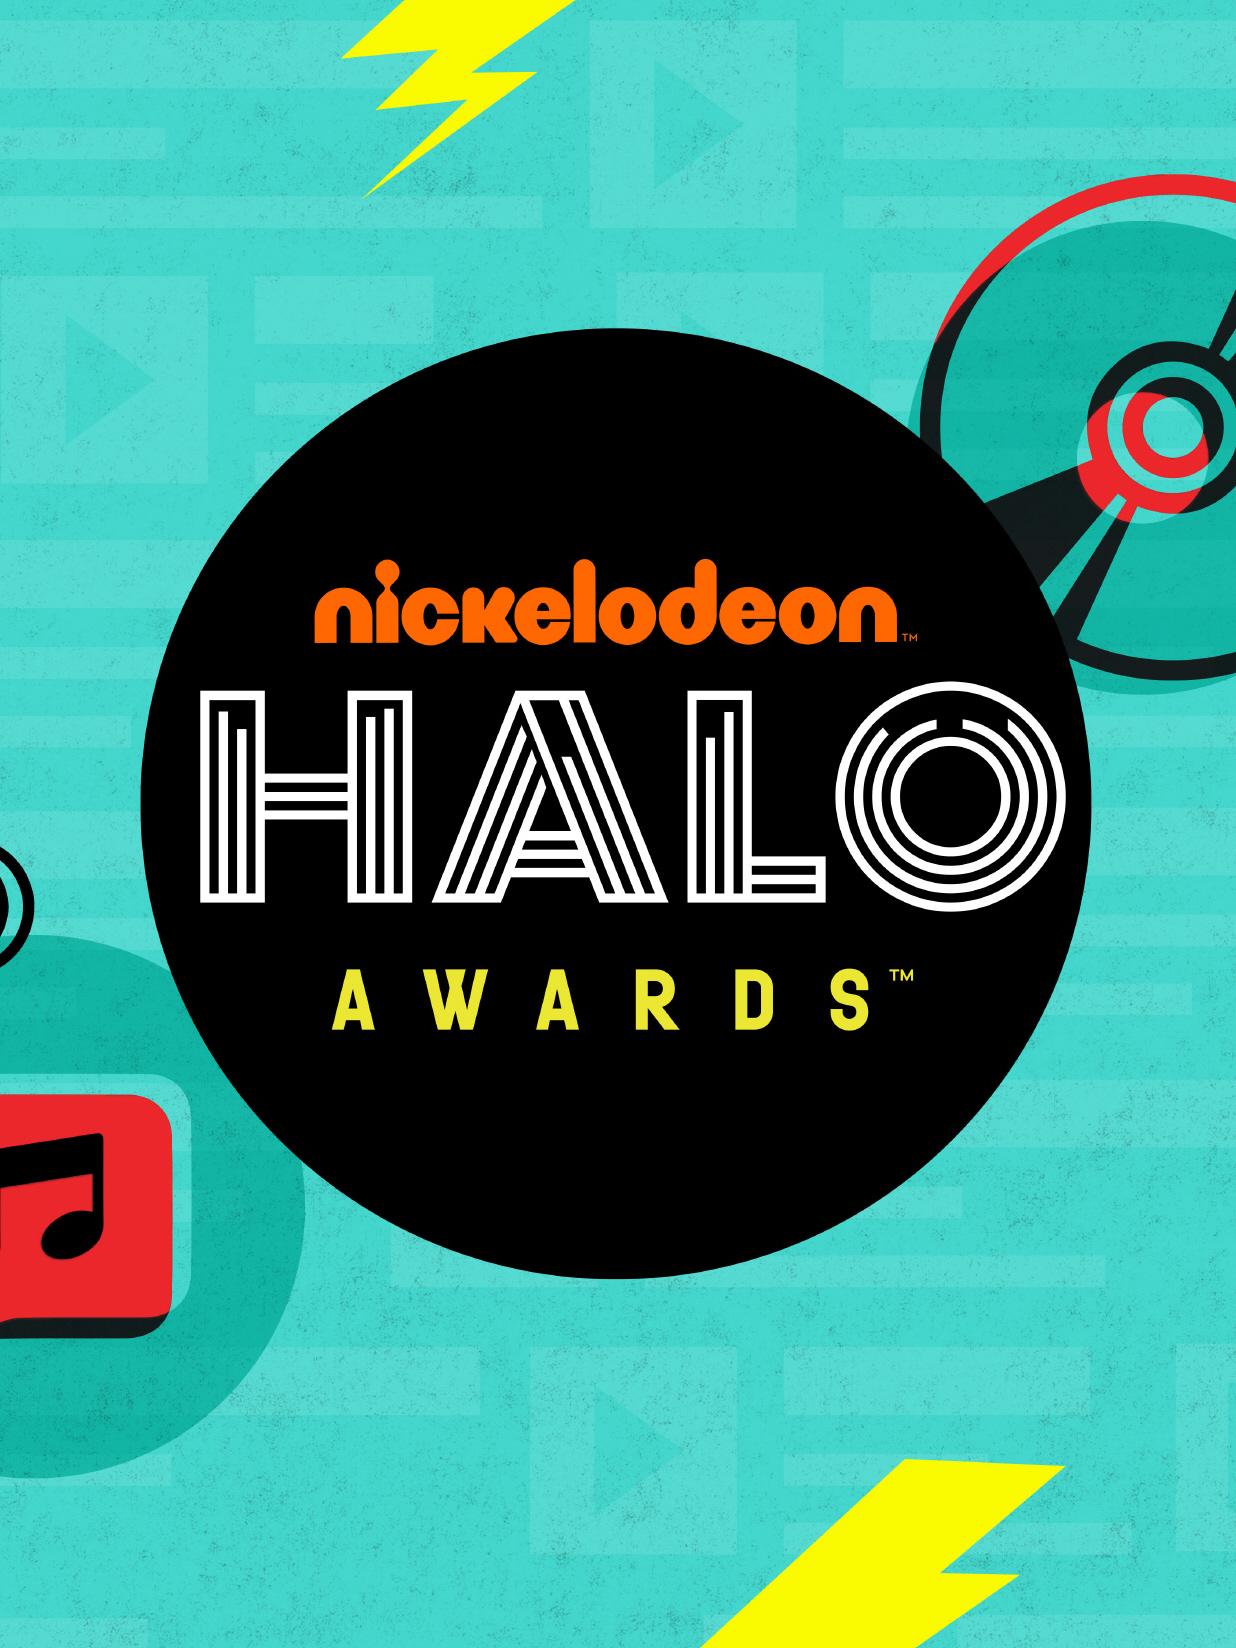 2017 Nickelodeon HALO Award Nominee (Top 25 United States) - September 2017